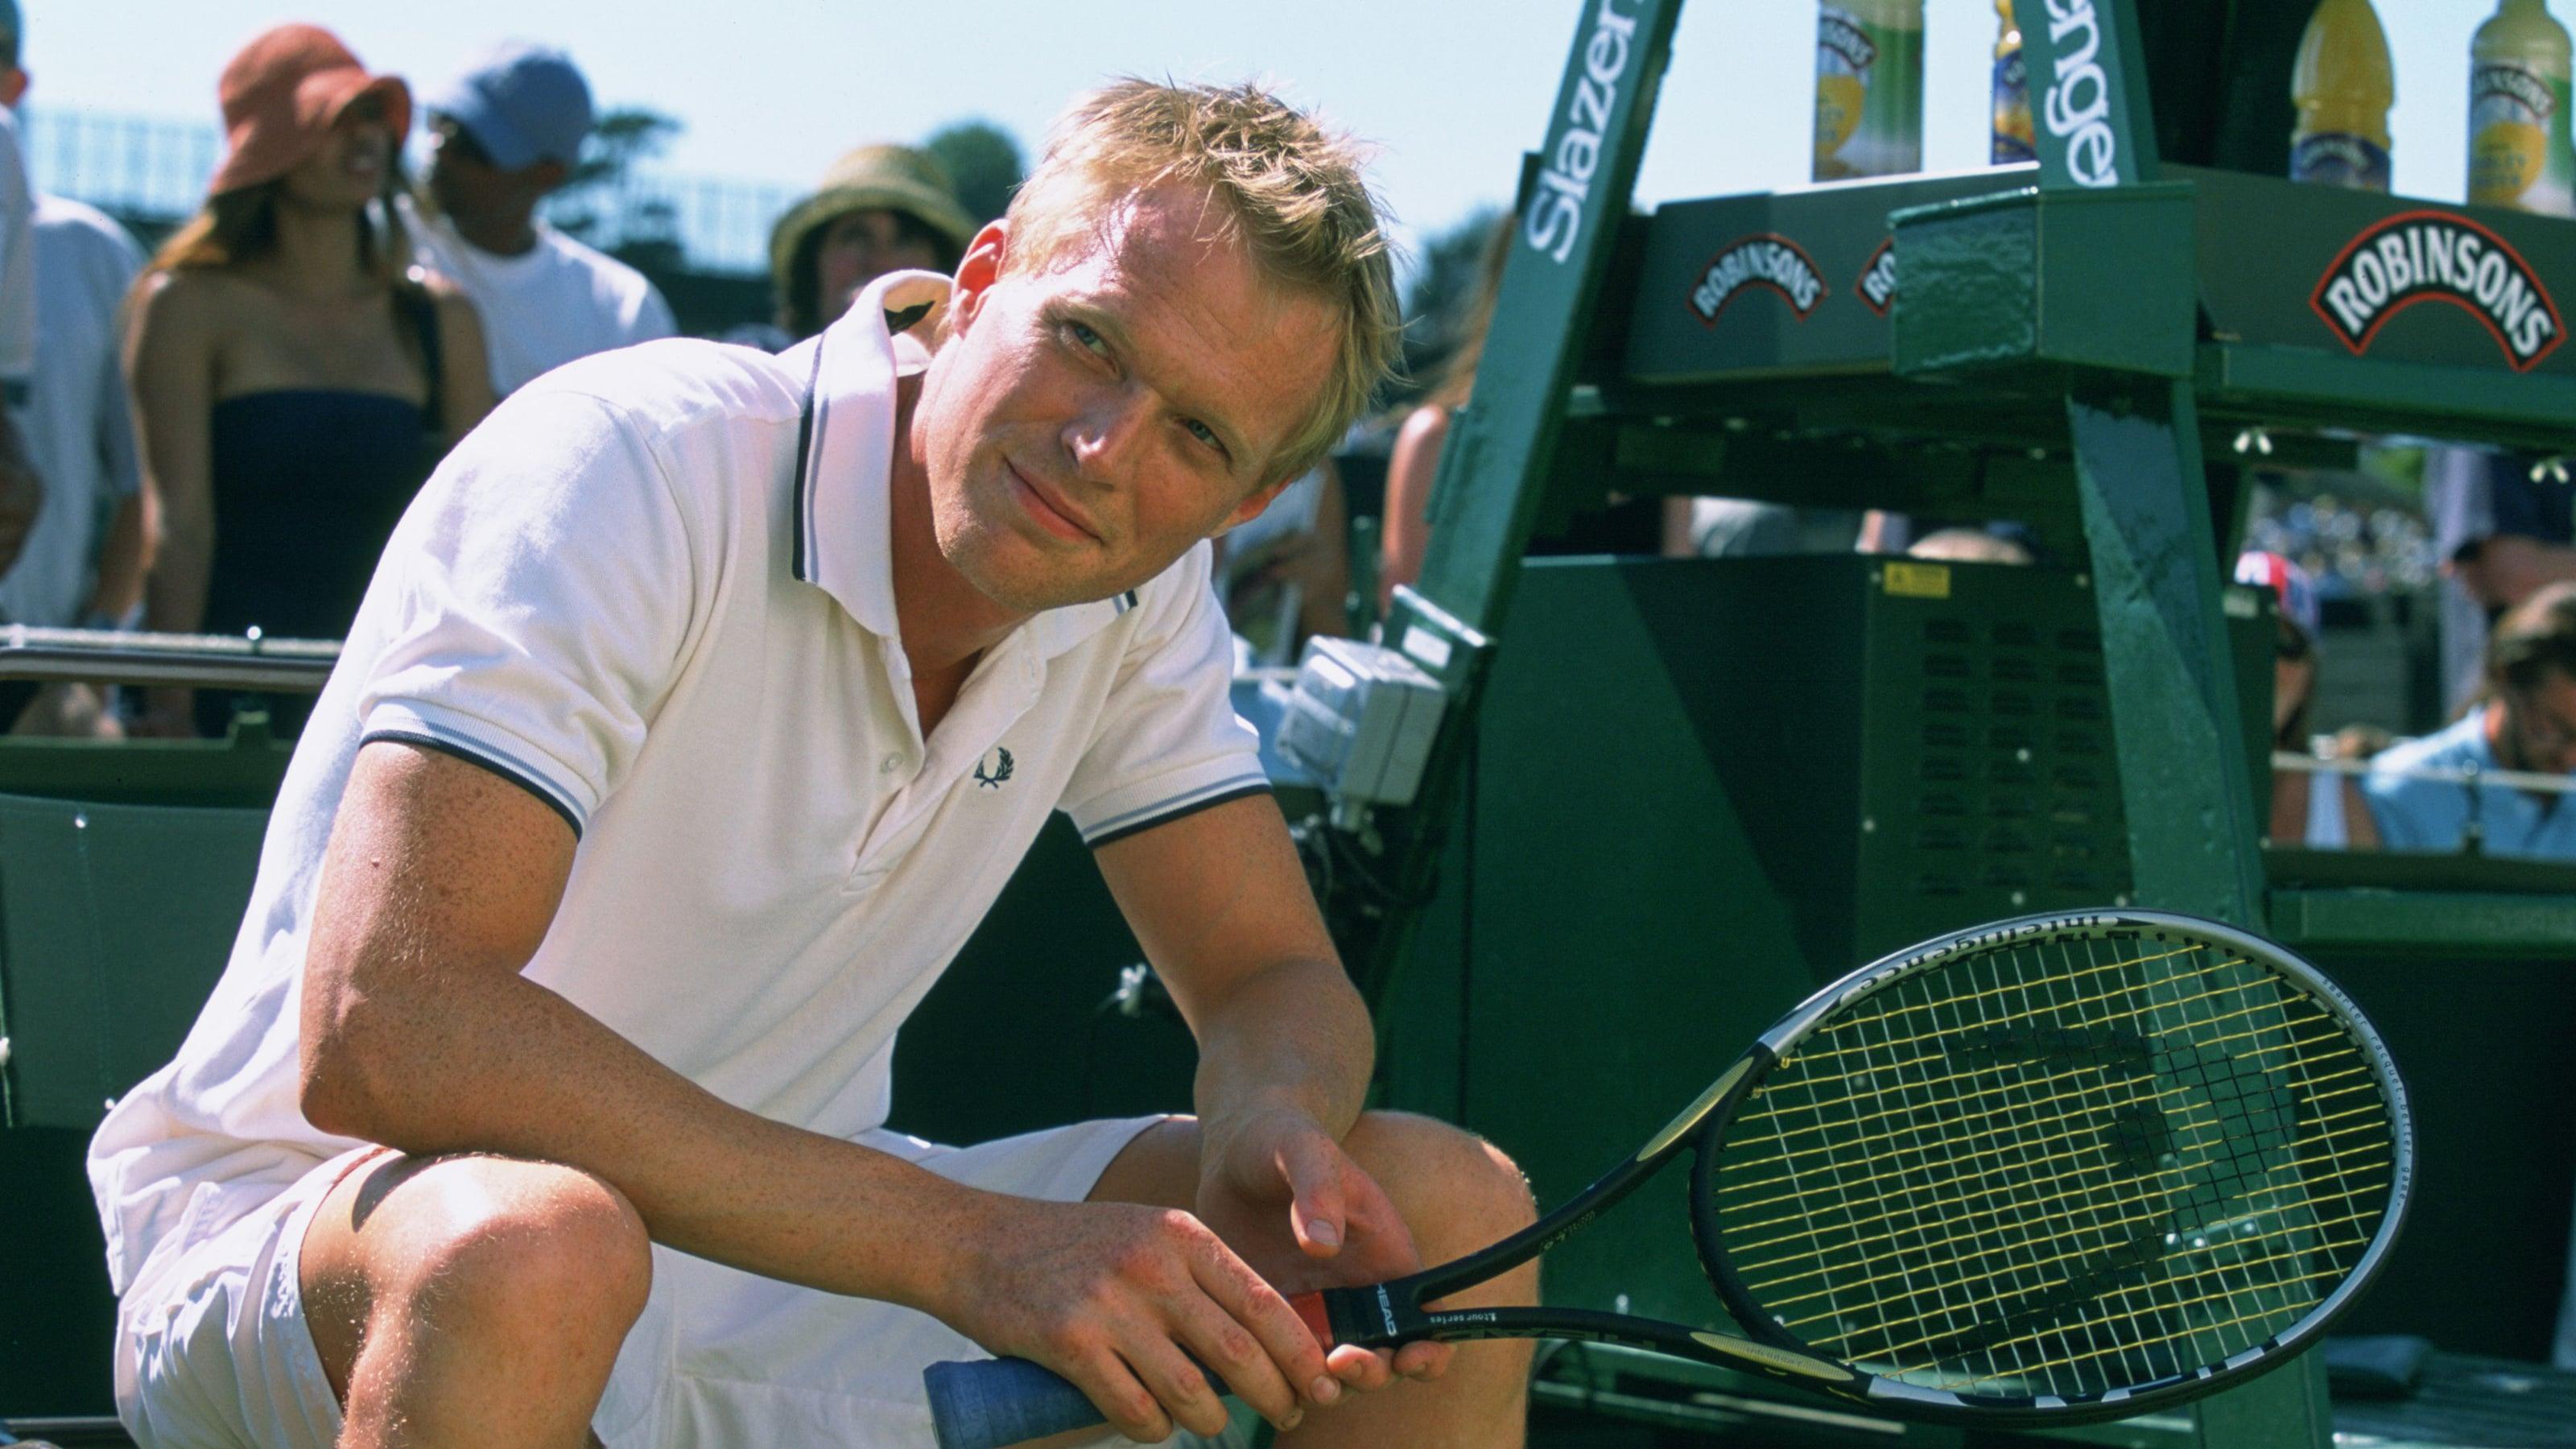 wimbledon 2004 film